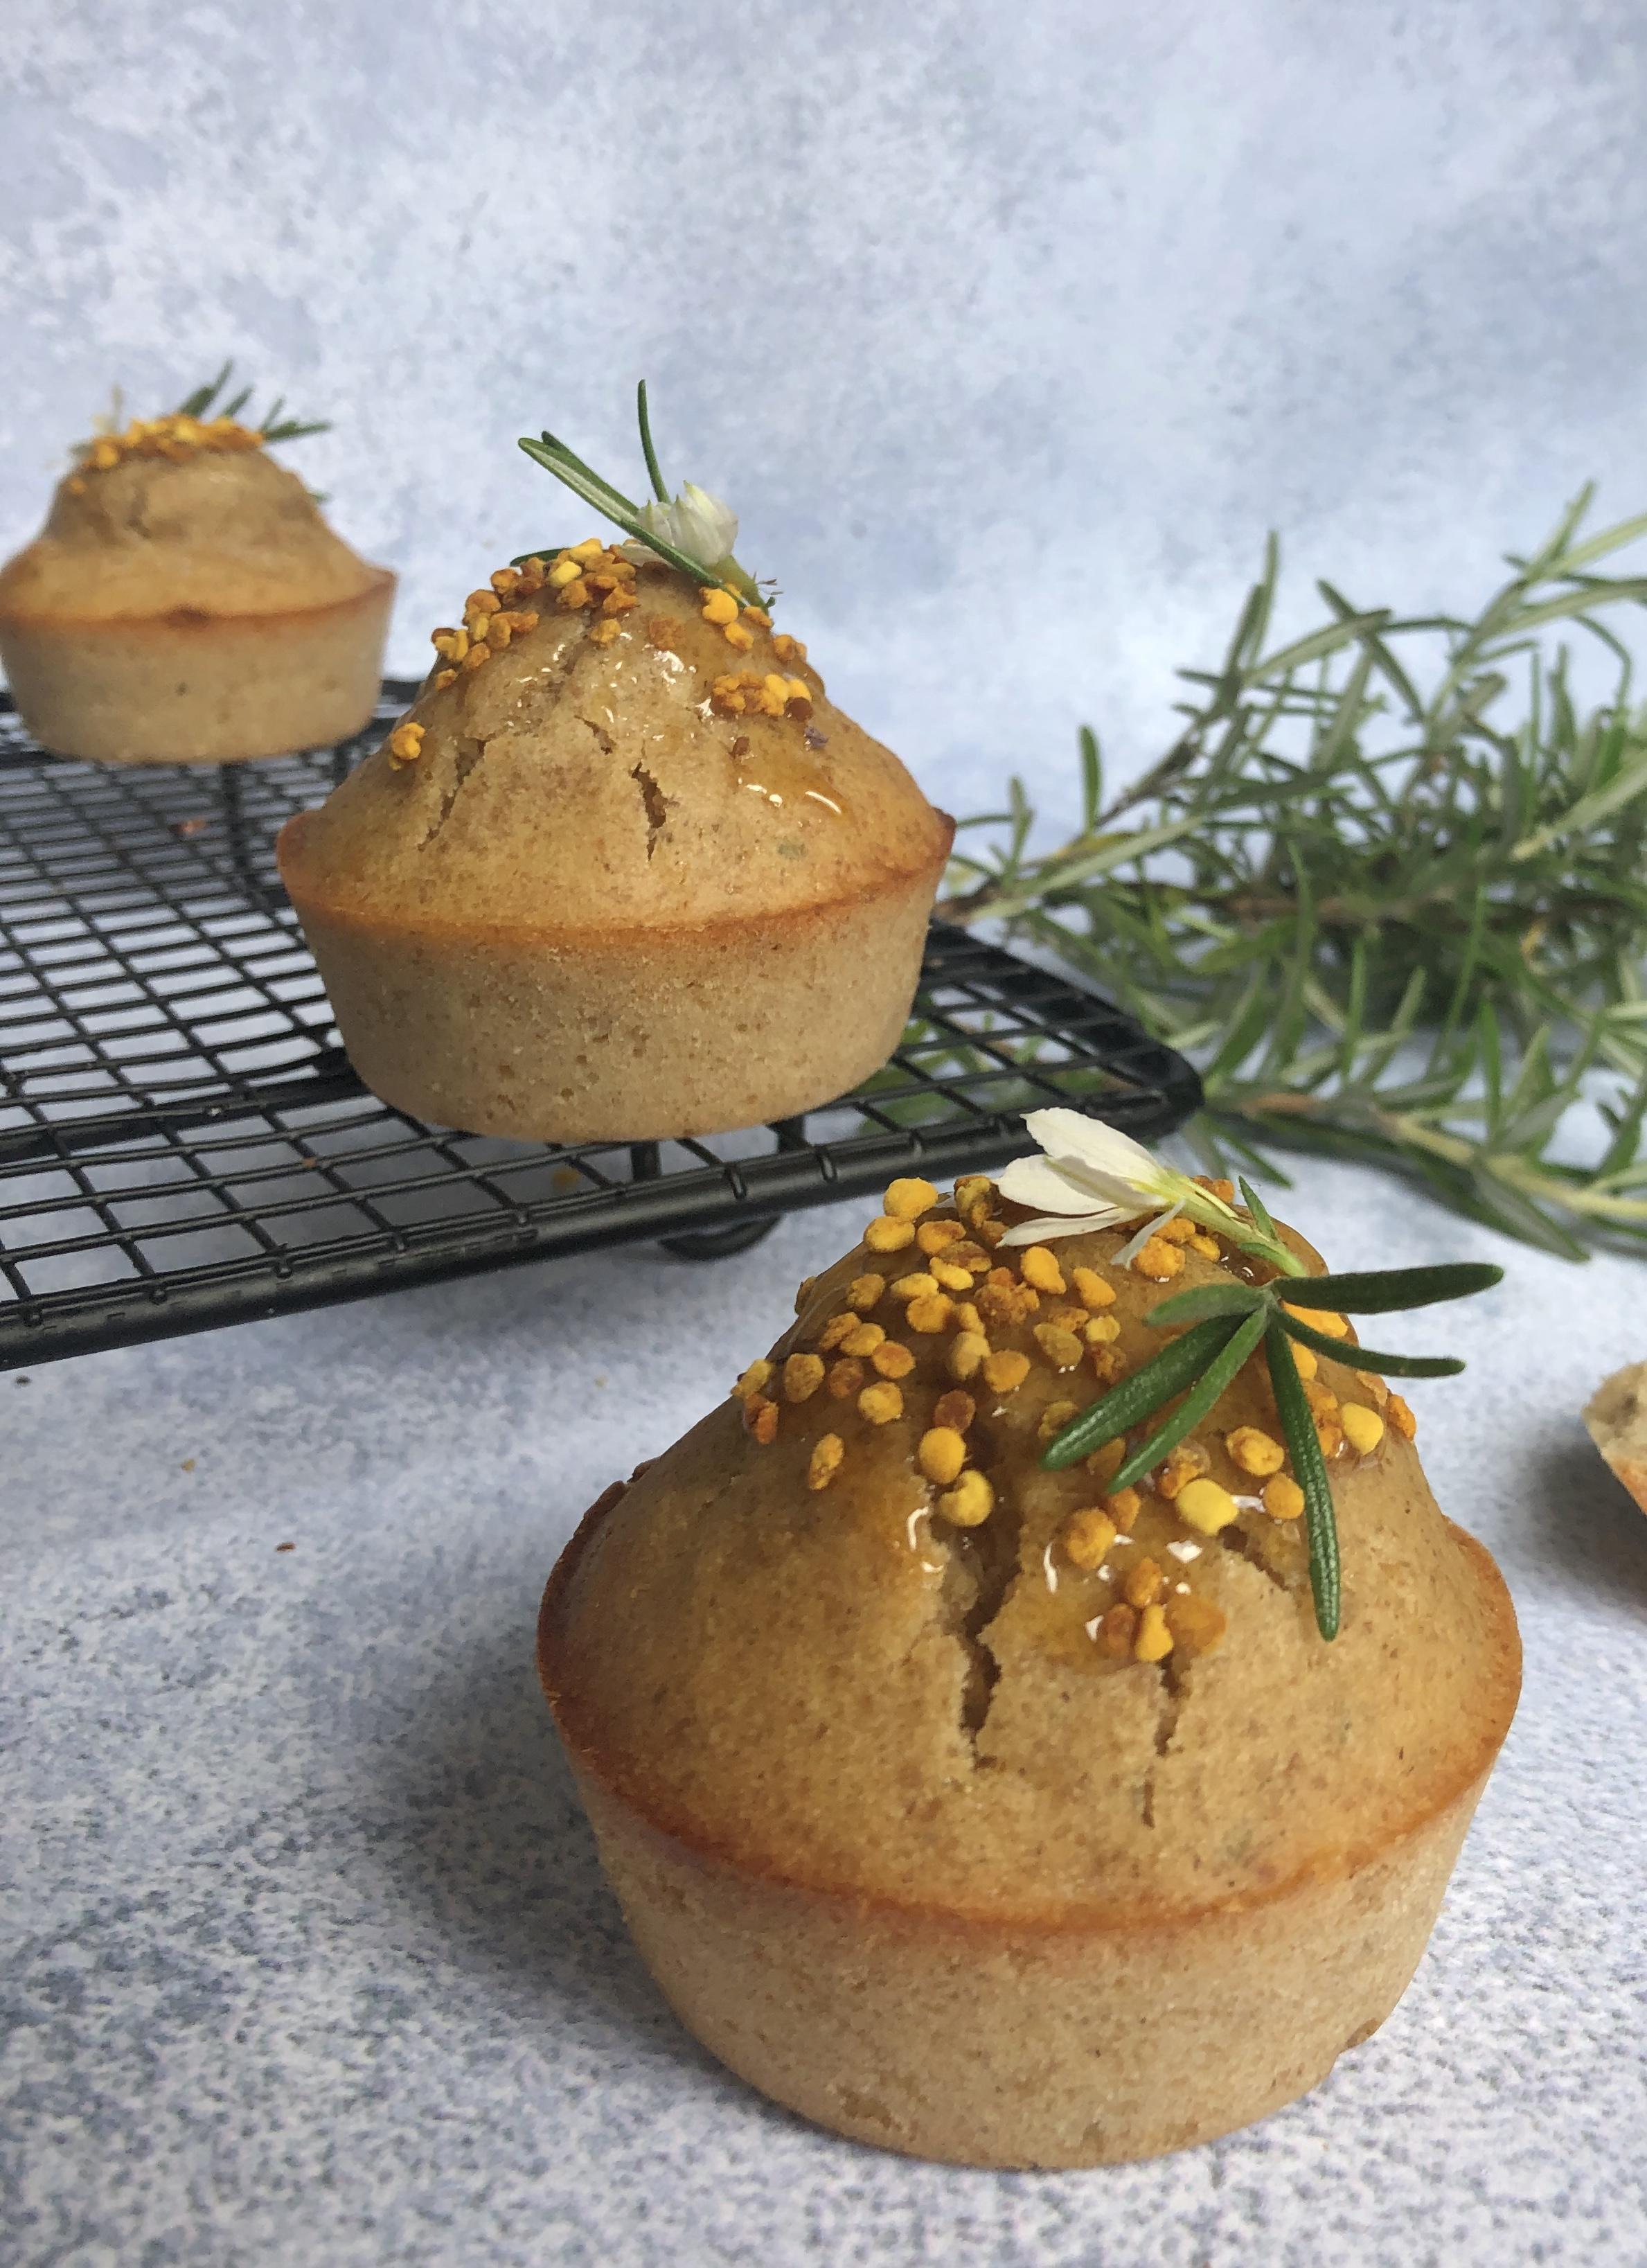 Muffin fleur d'oranger, miel et romarin au levain